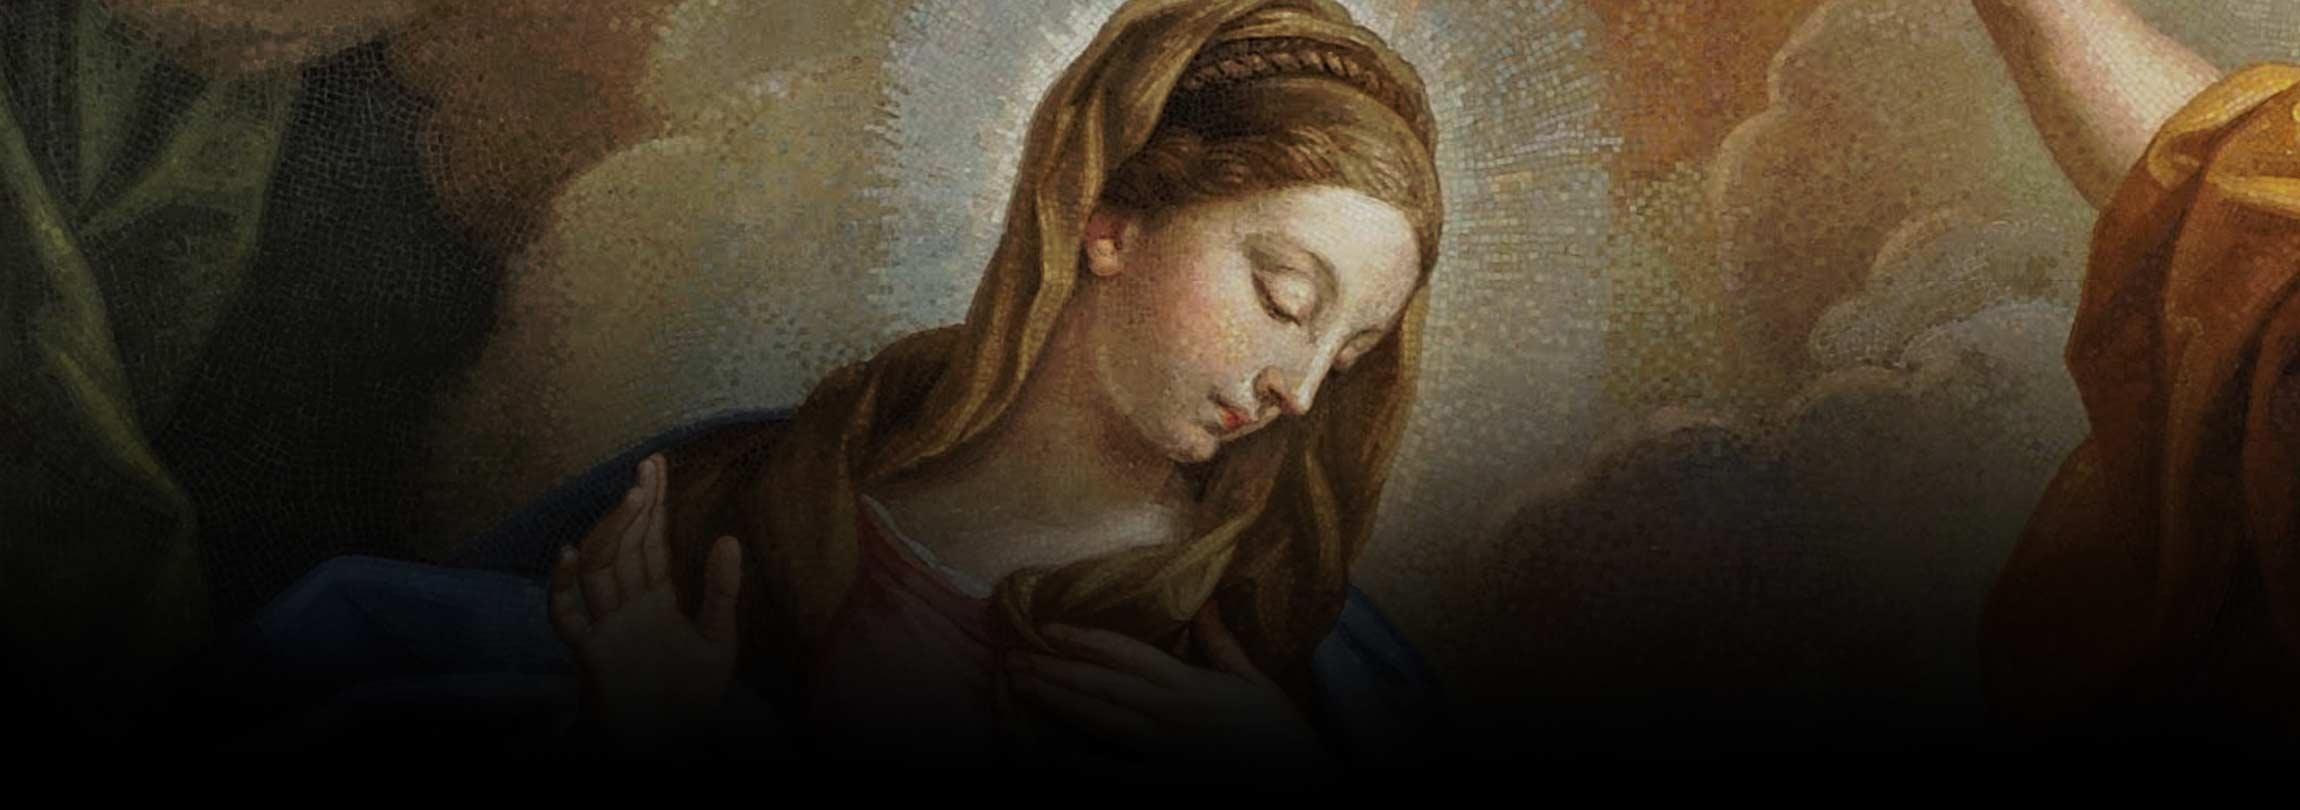 Maria: o segredo das famílias santas